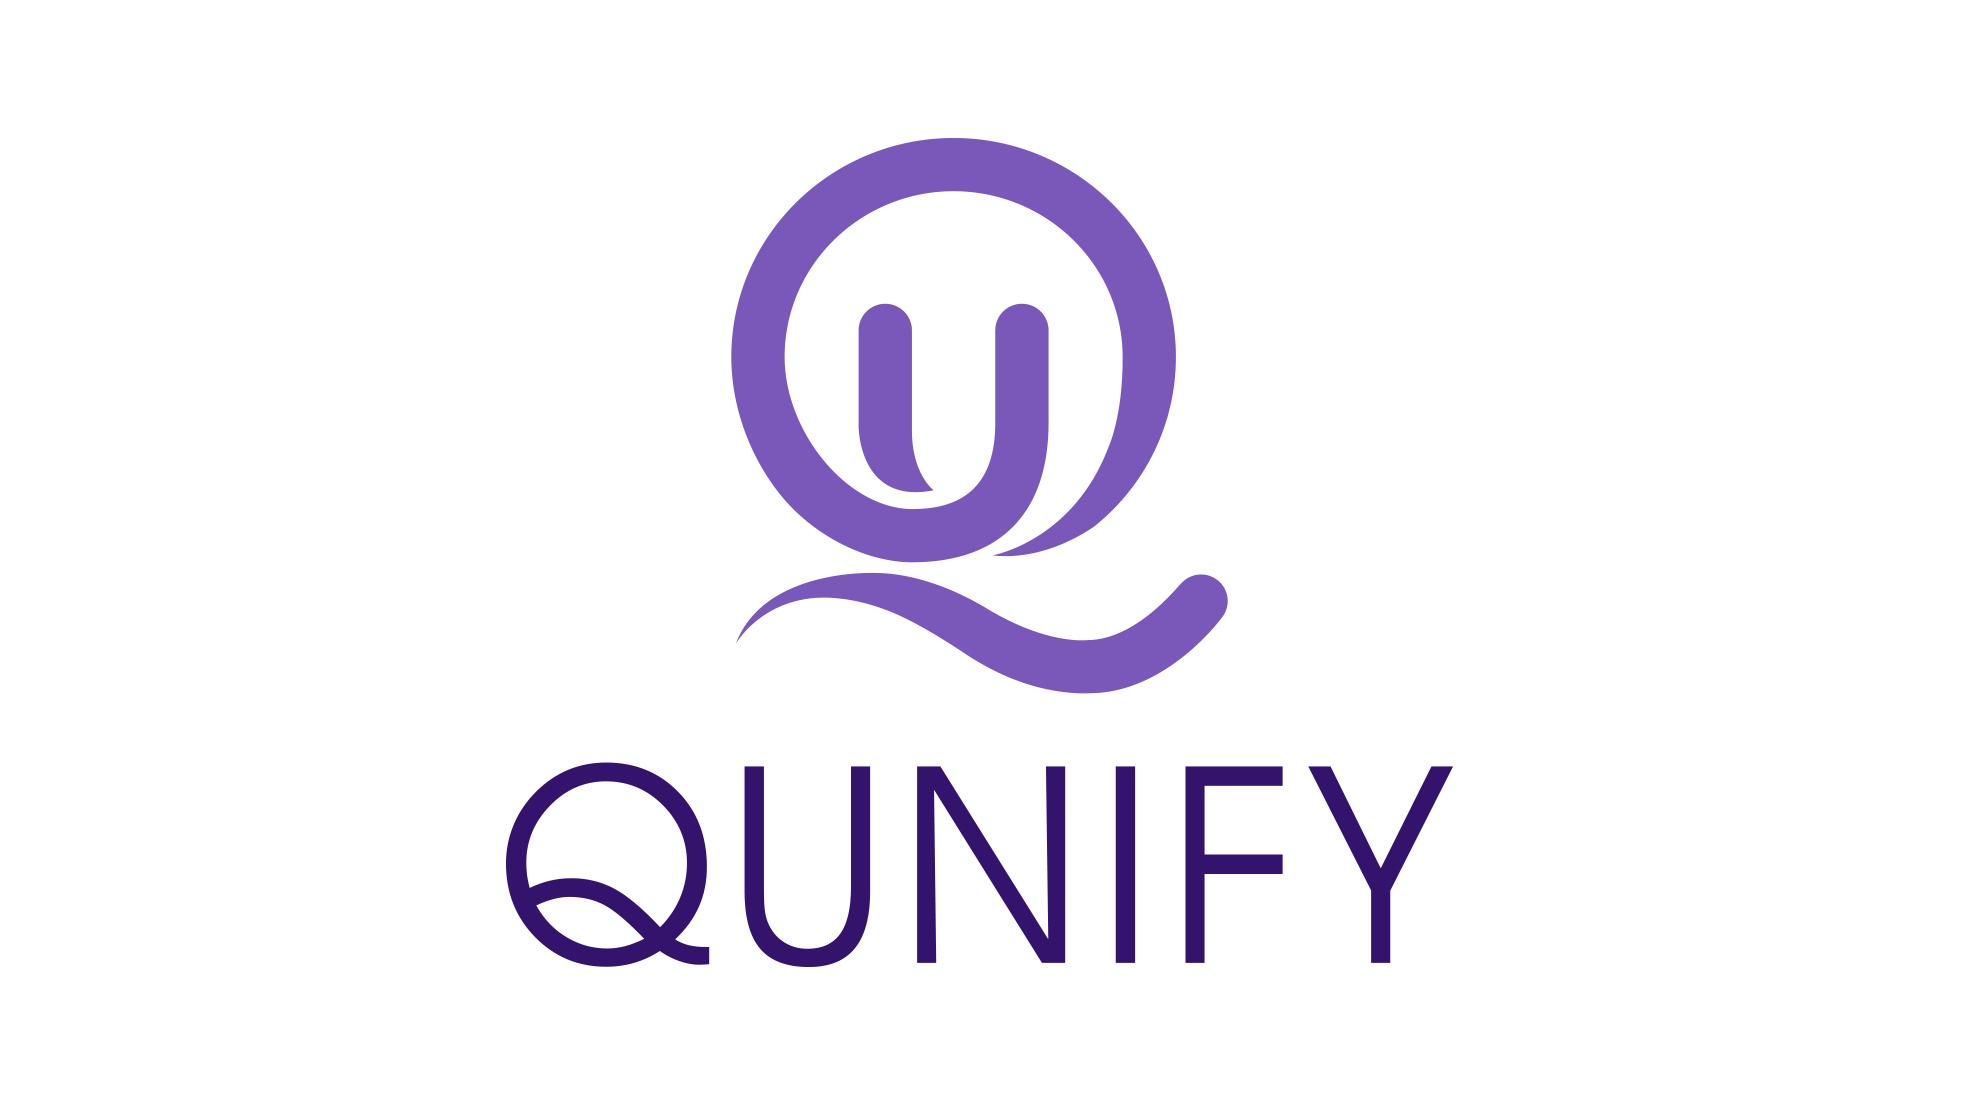 Qunify vertical logo